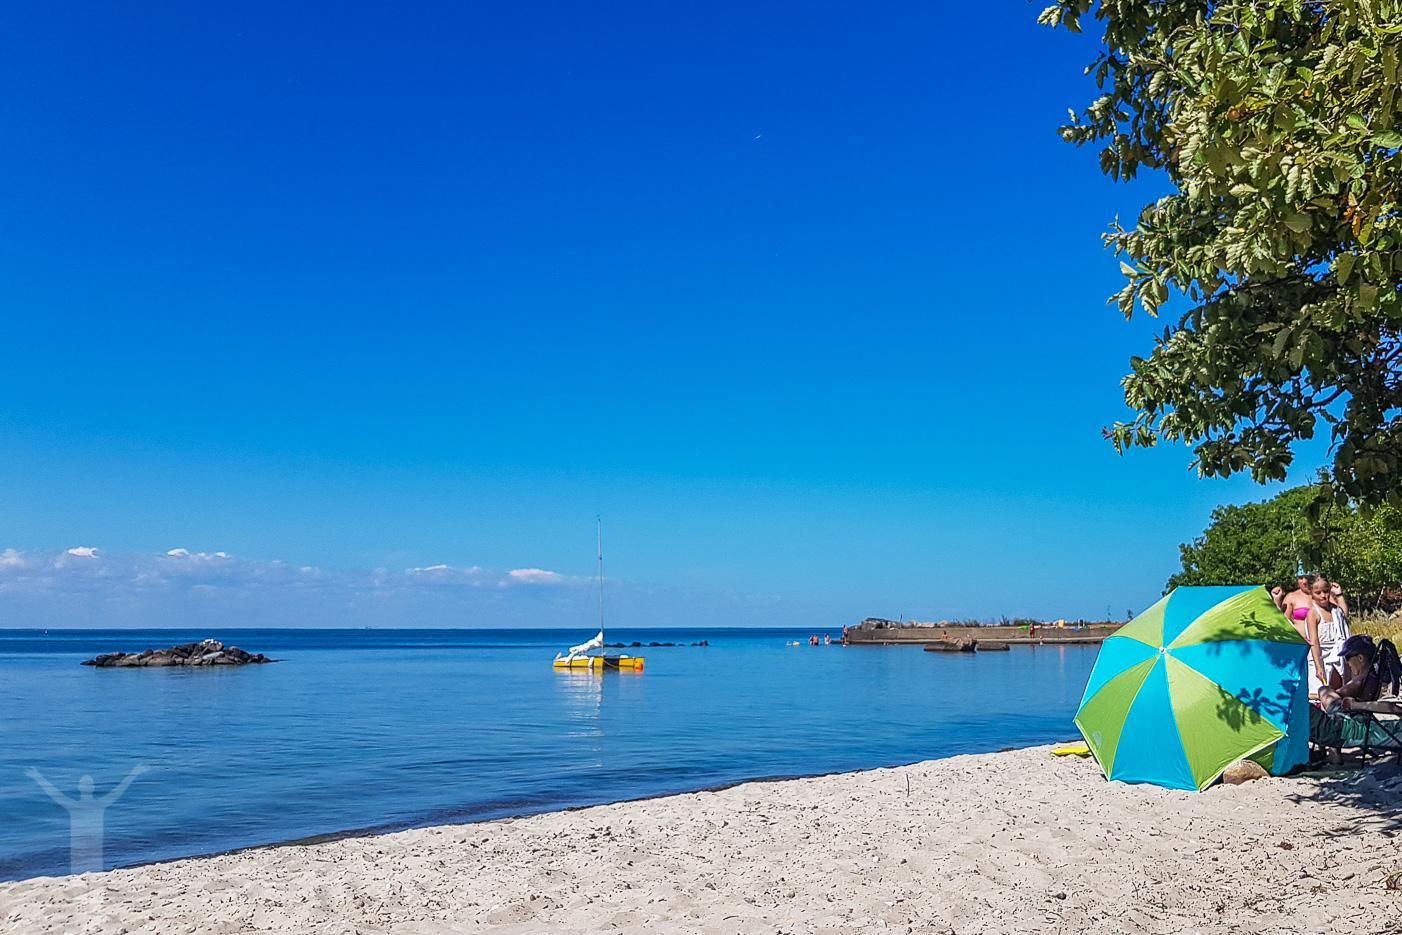 Lundegårds camping på Öland